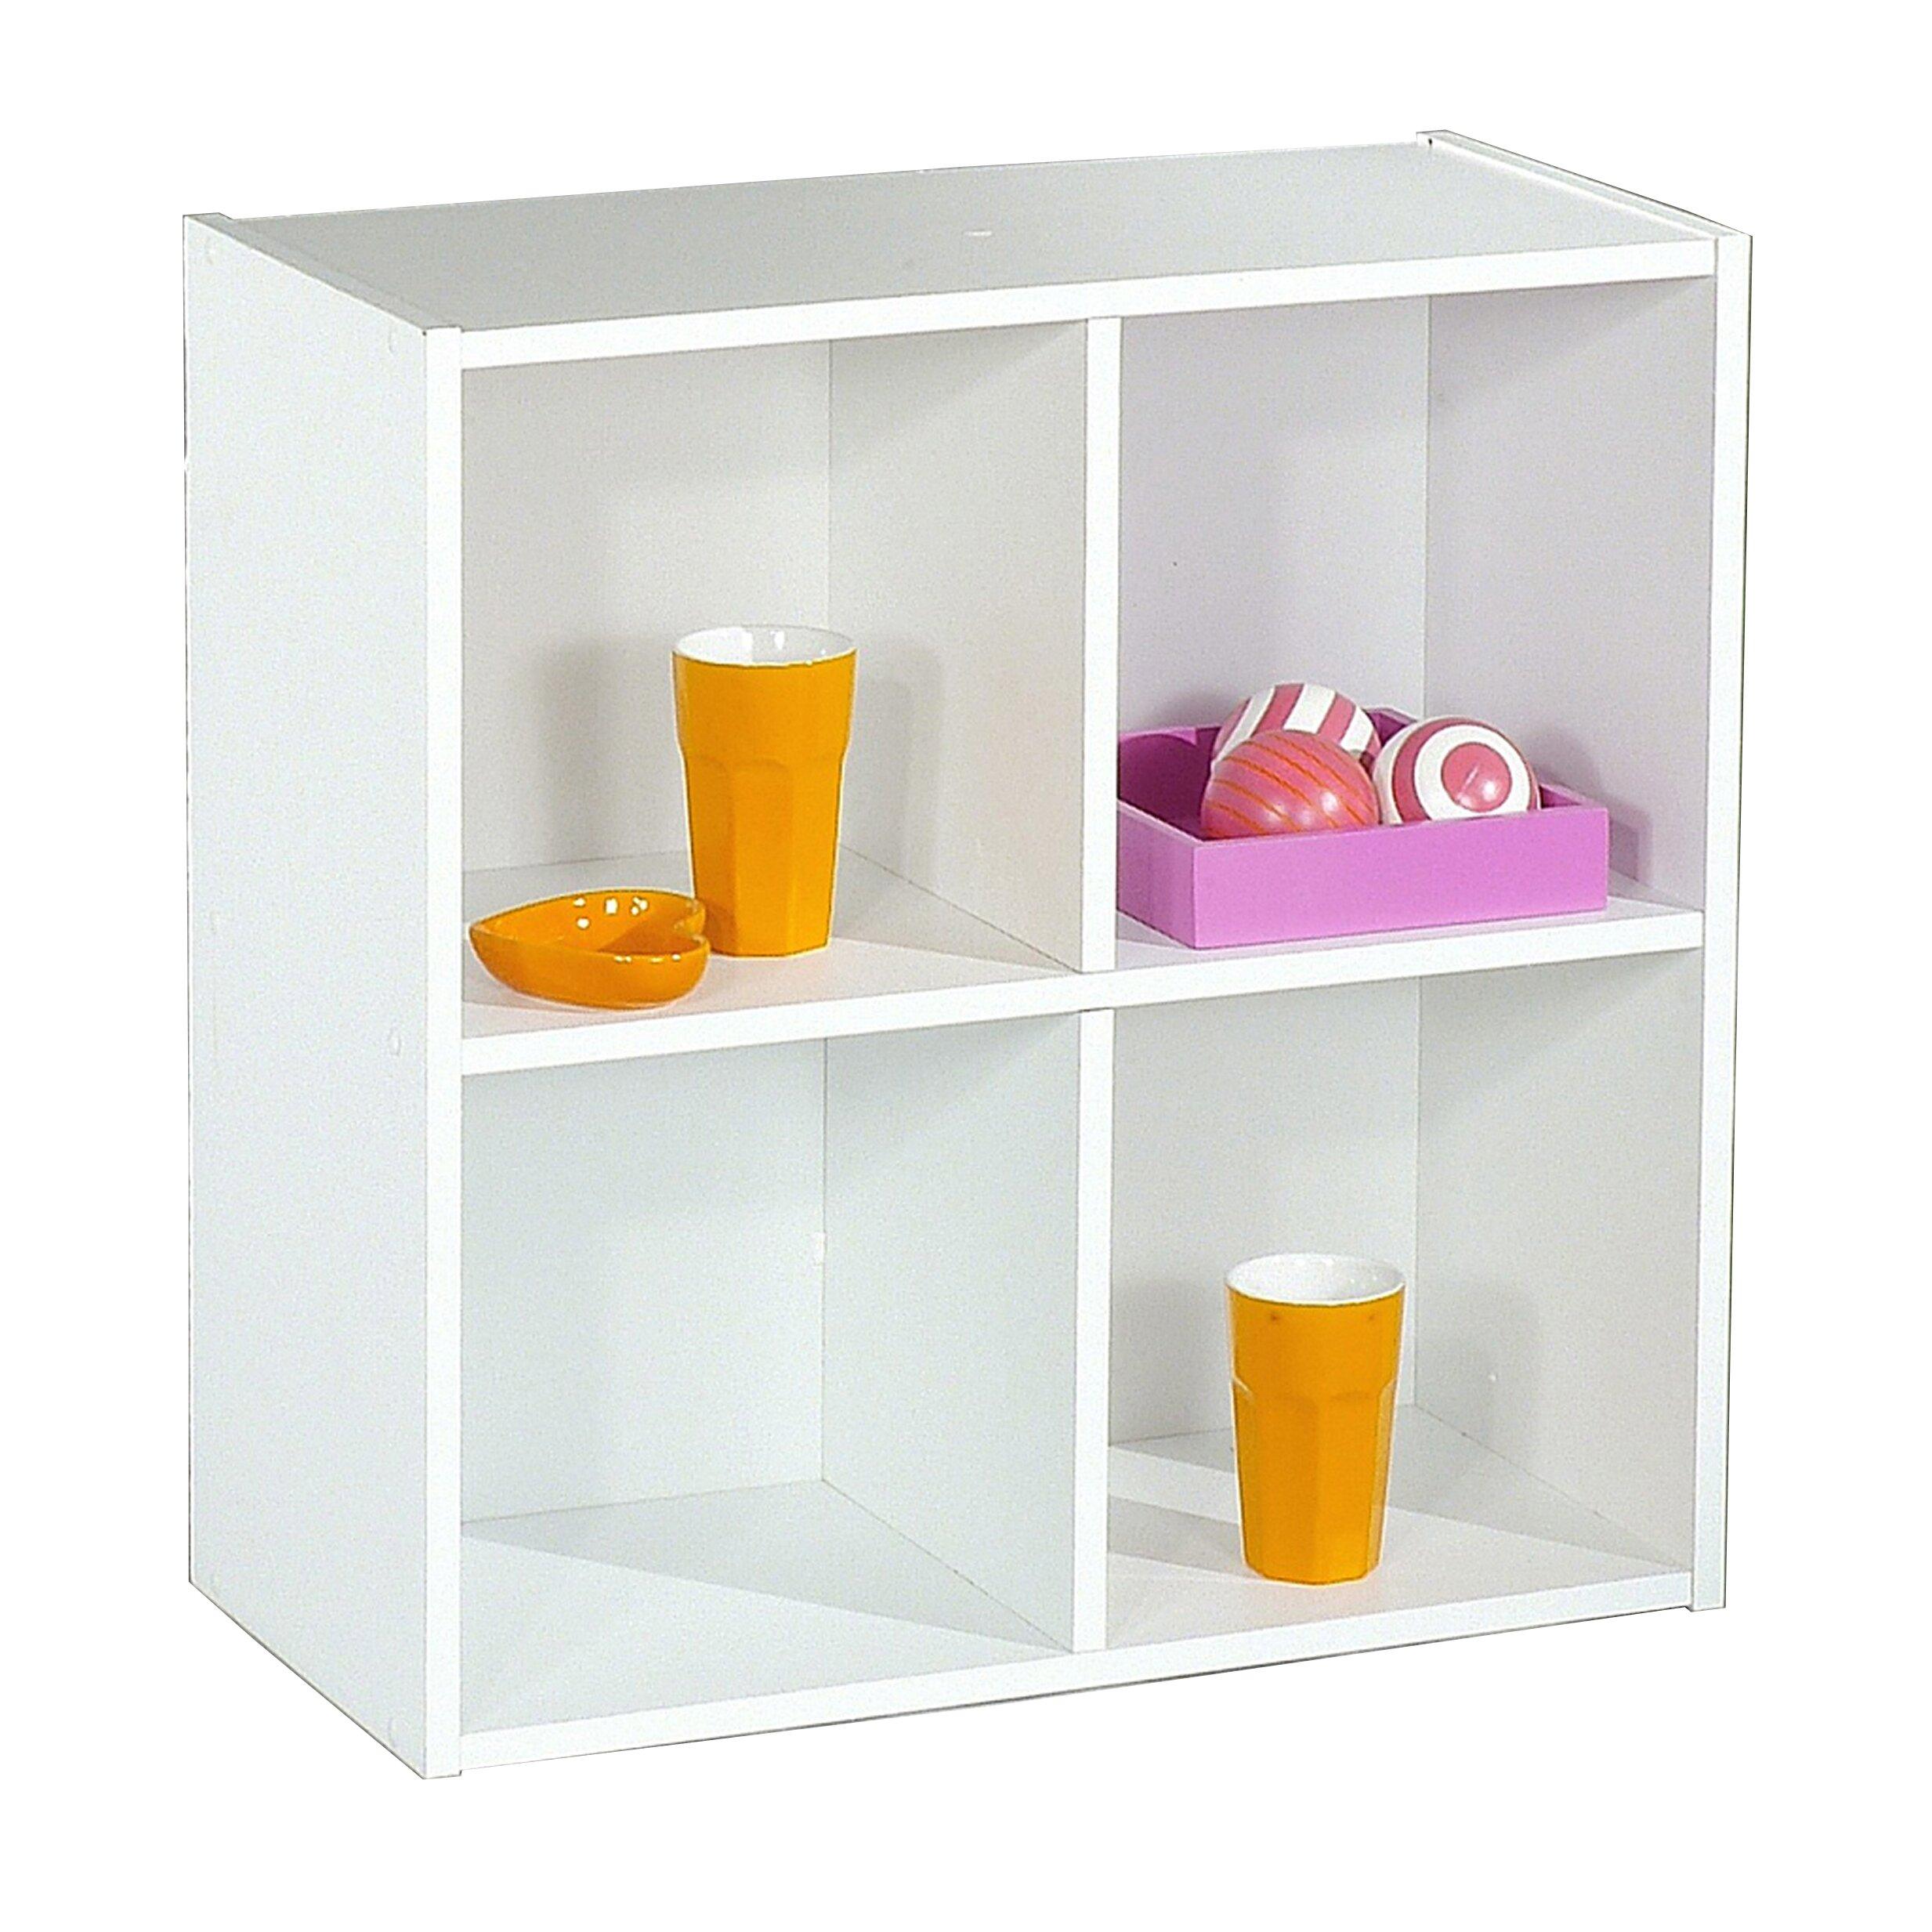 Homestead Living Facile Compo 7 Low Cube Unit